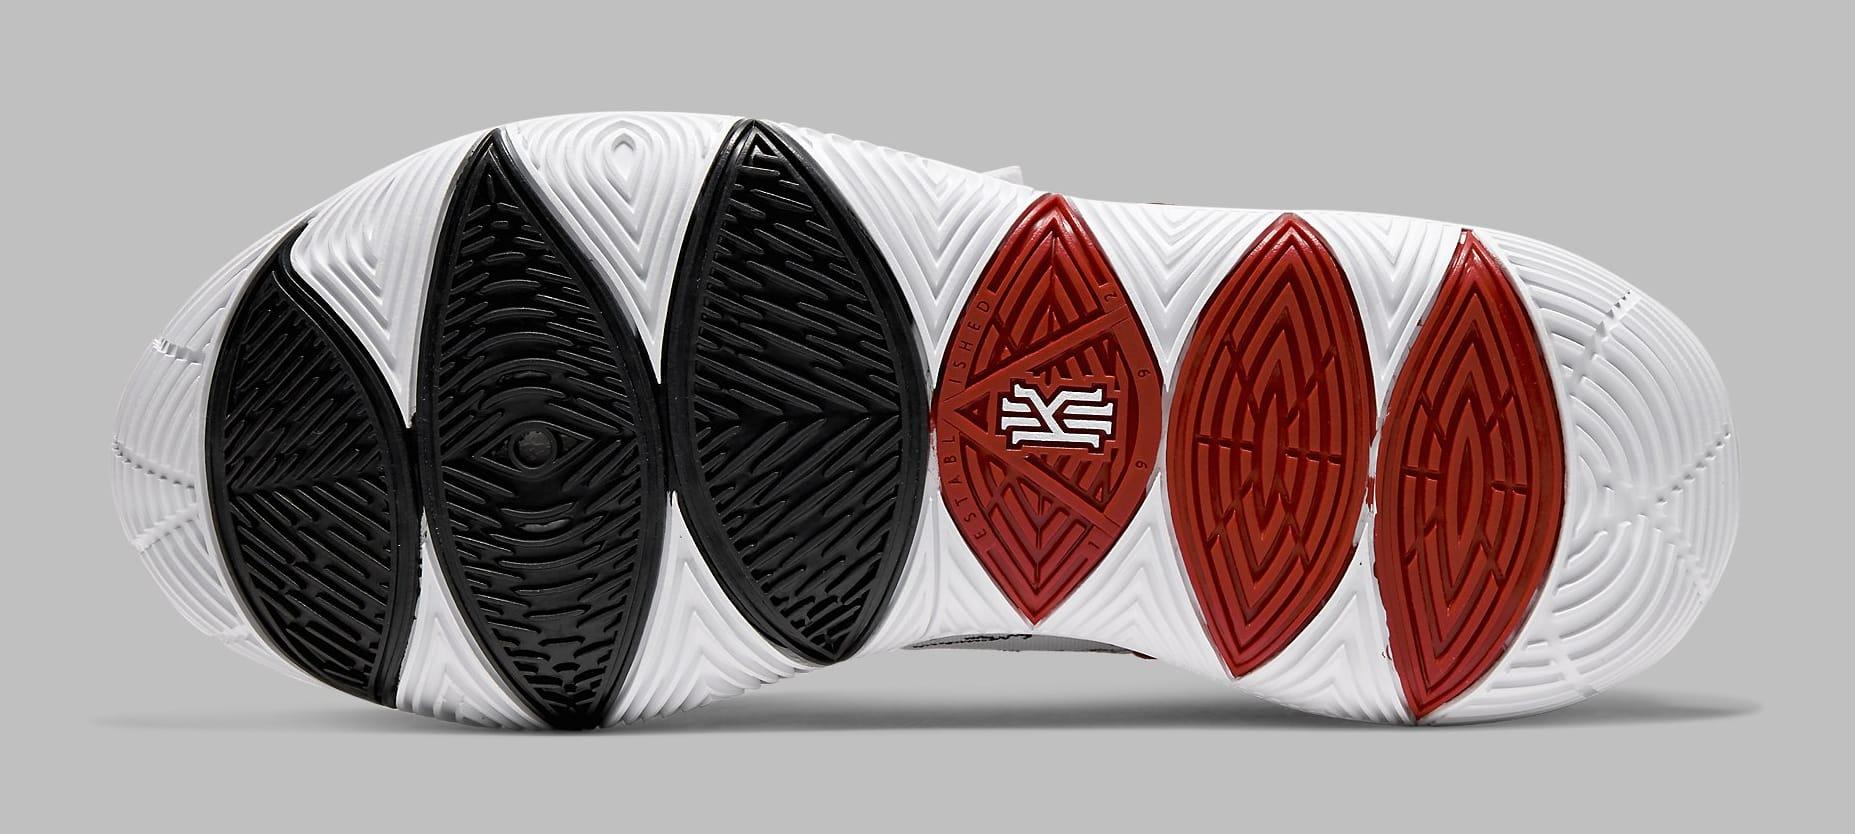 sneaker-room-nike-kyrie-5-mom-cu0677-100-outsole